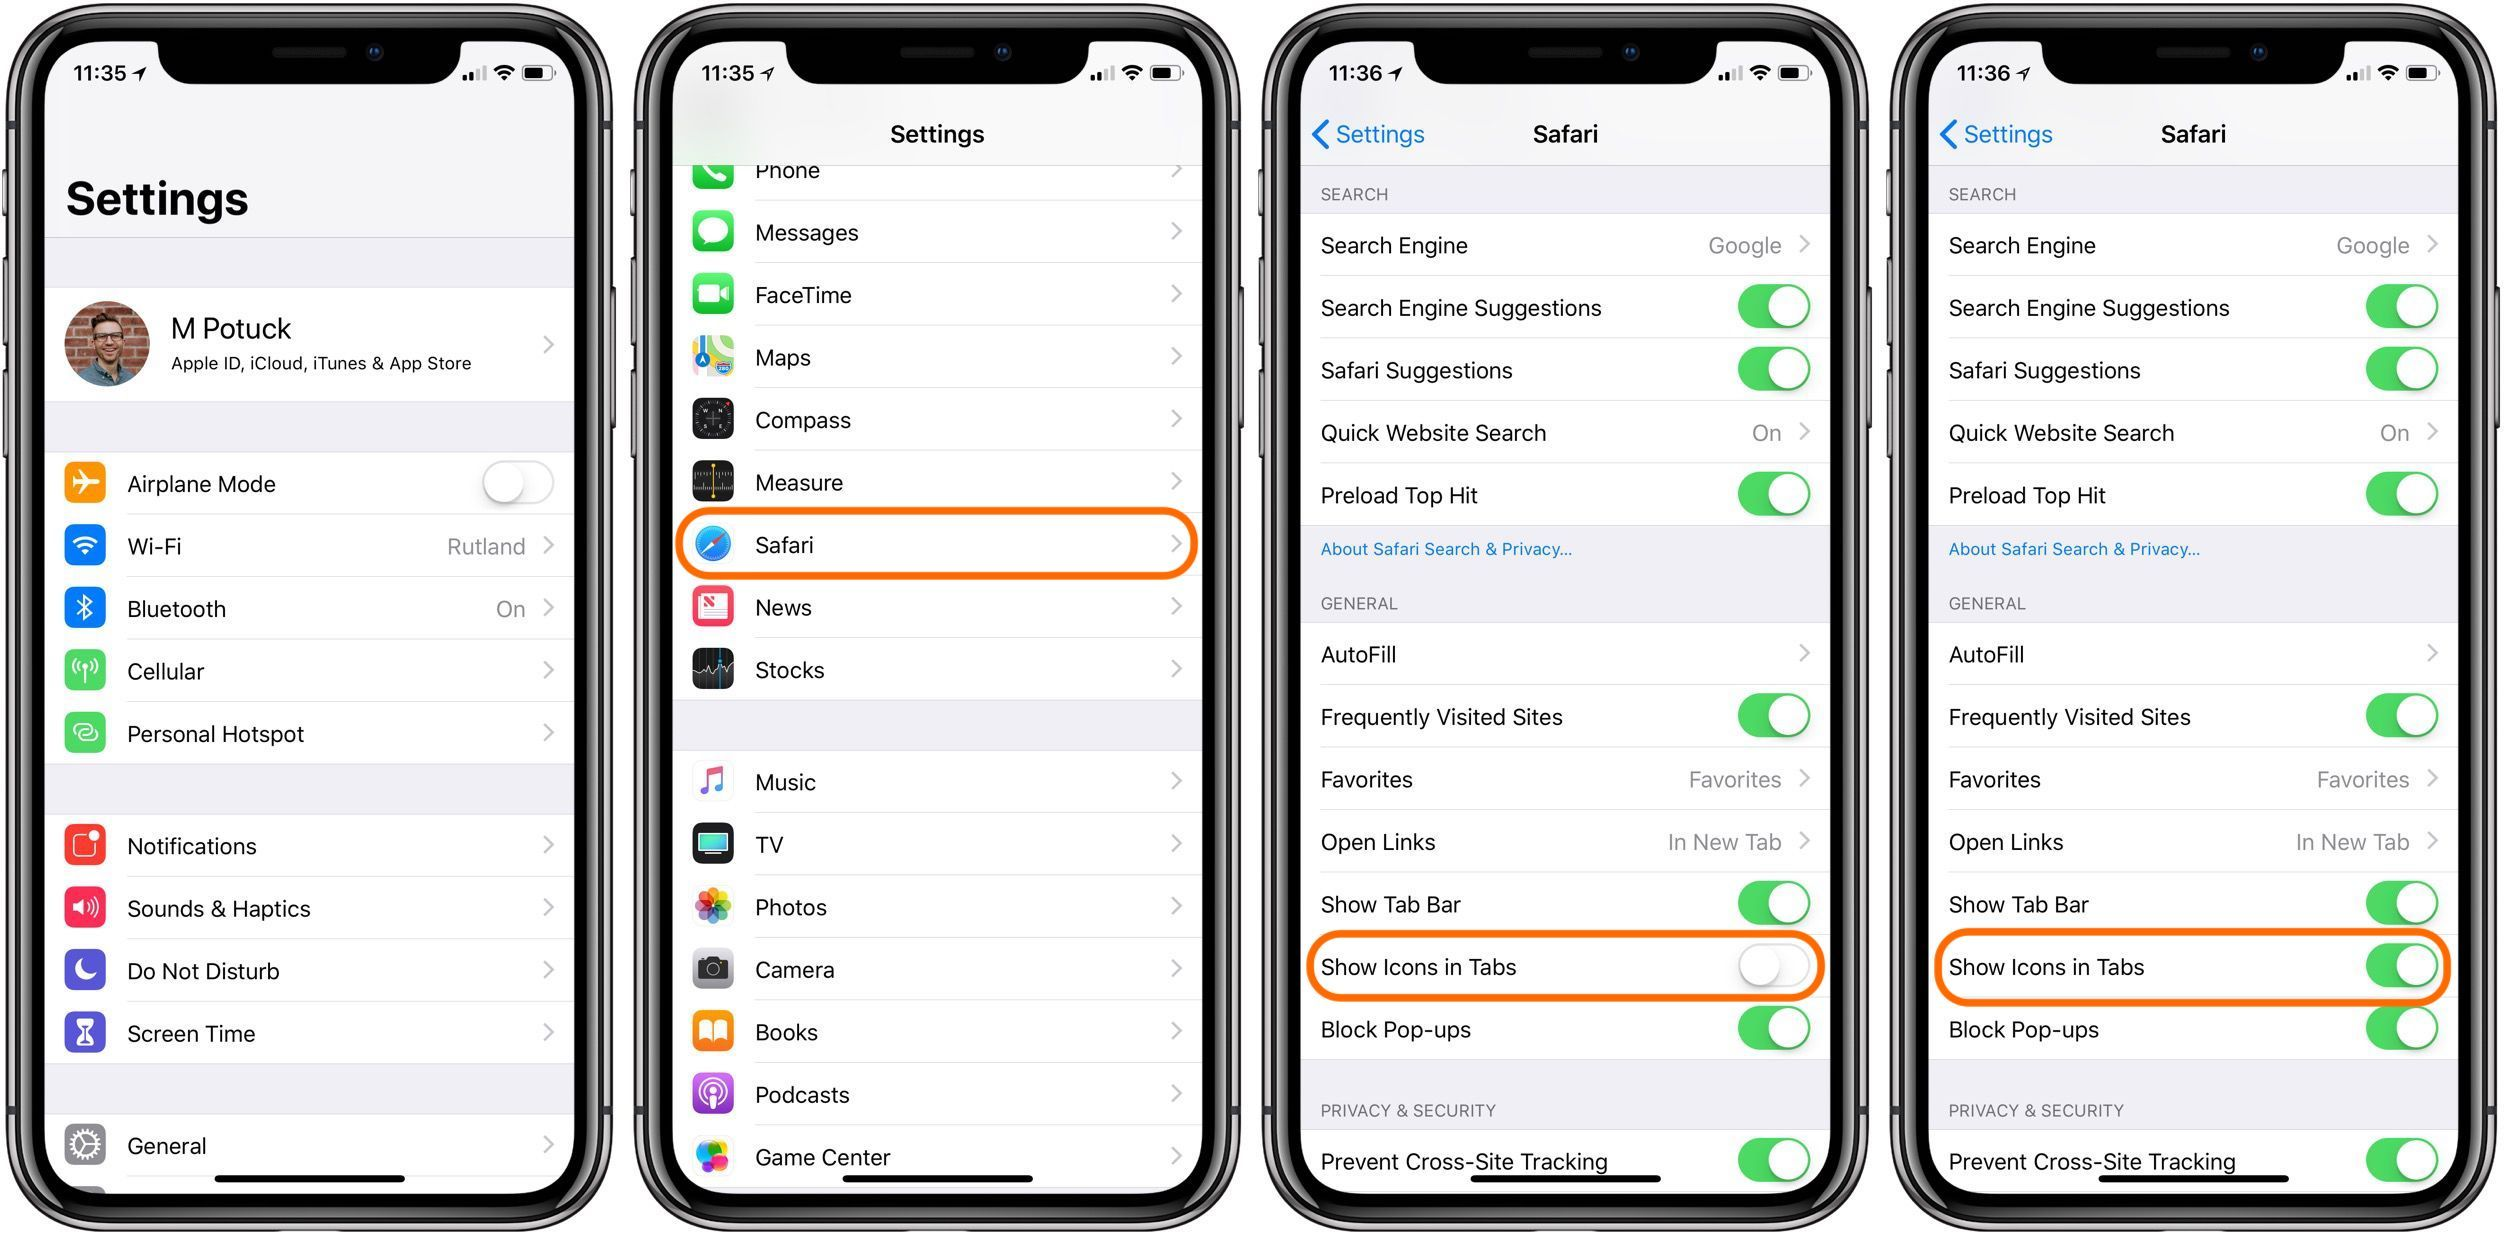 how-to-show-icons-safari-tabs-iphone-ipad-ios-12-1.jpg